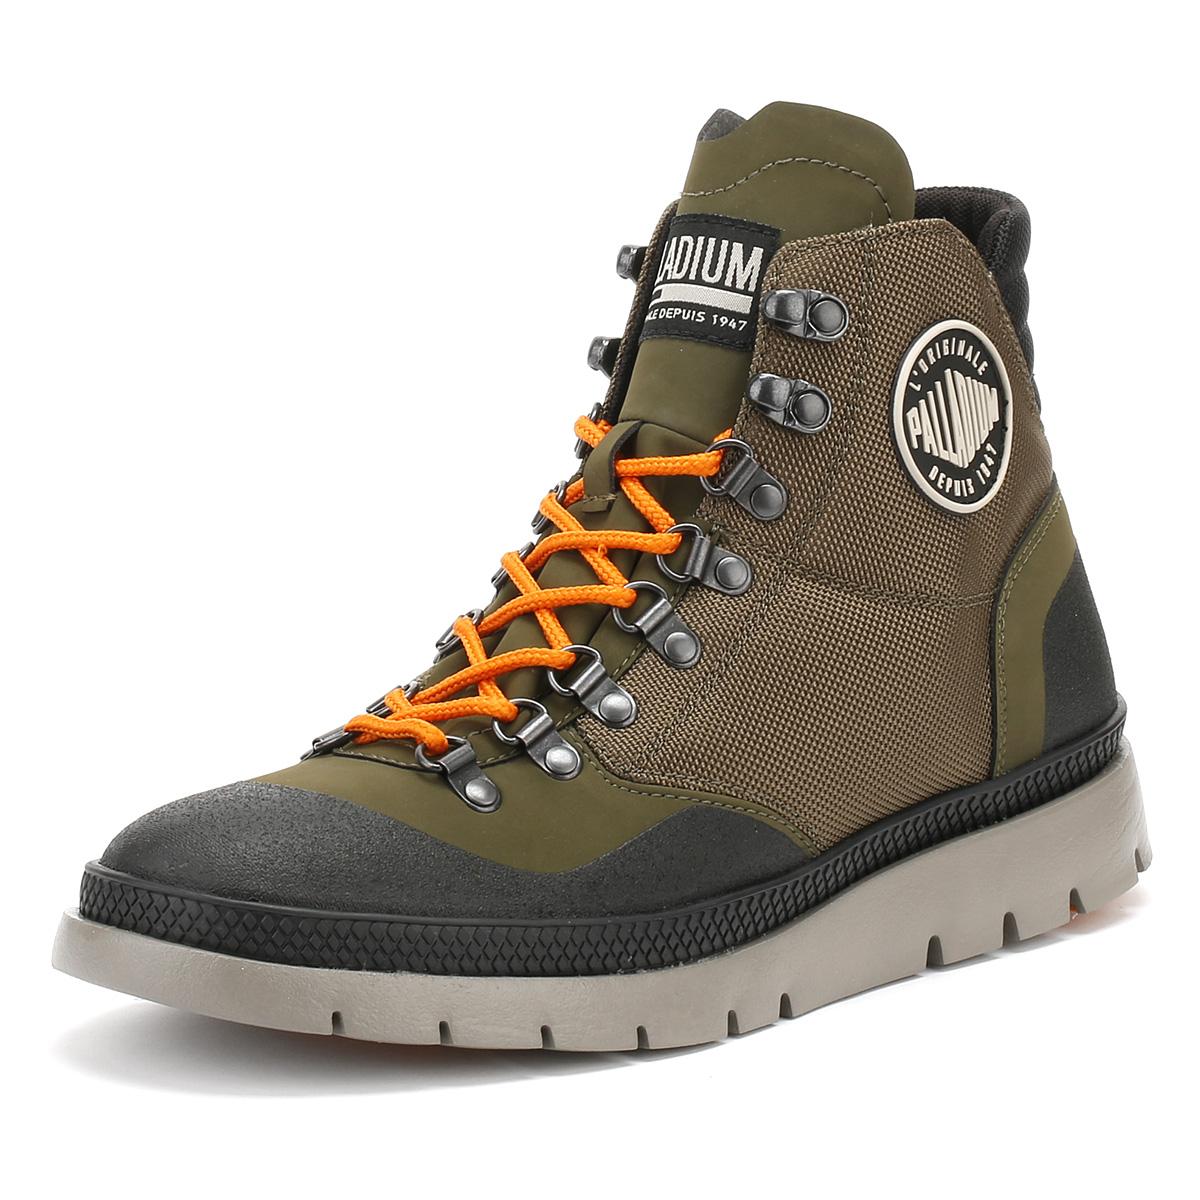 Palladium Mens Pallasider HIKR Mid Hiker Boots Waterproof Winter Ankle Shoes